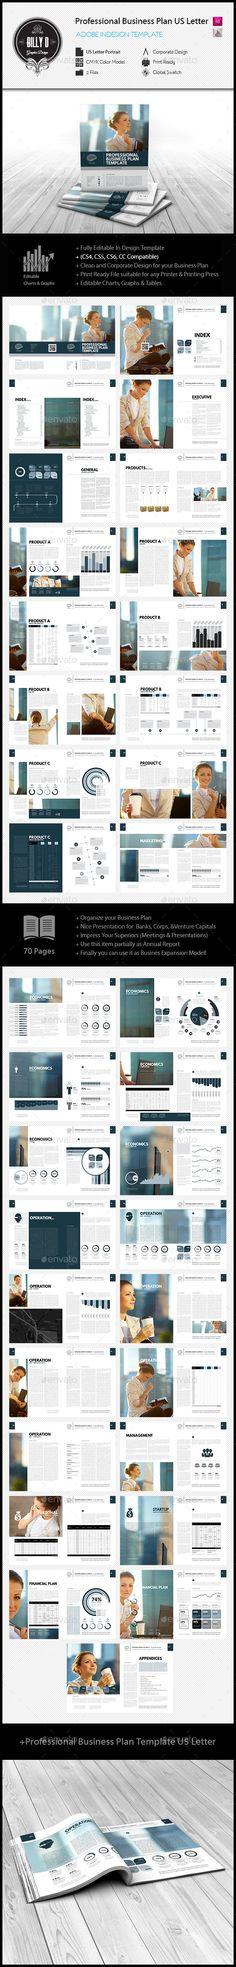 Professional Digital Business Plan Template  Business Plan